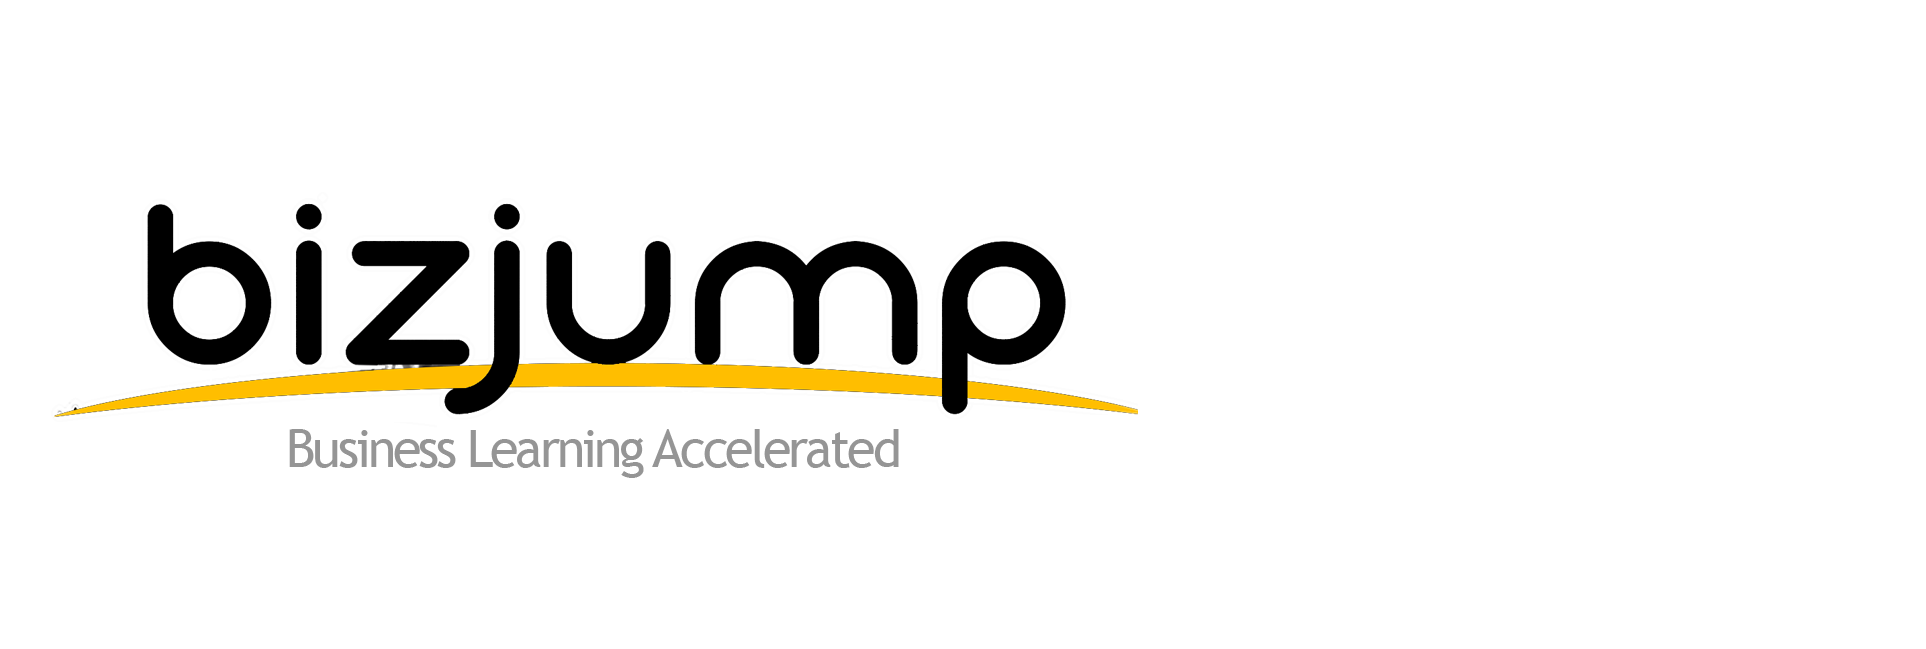 Bizjump: Business Development Accelerated